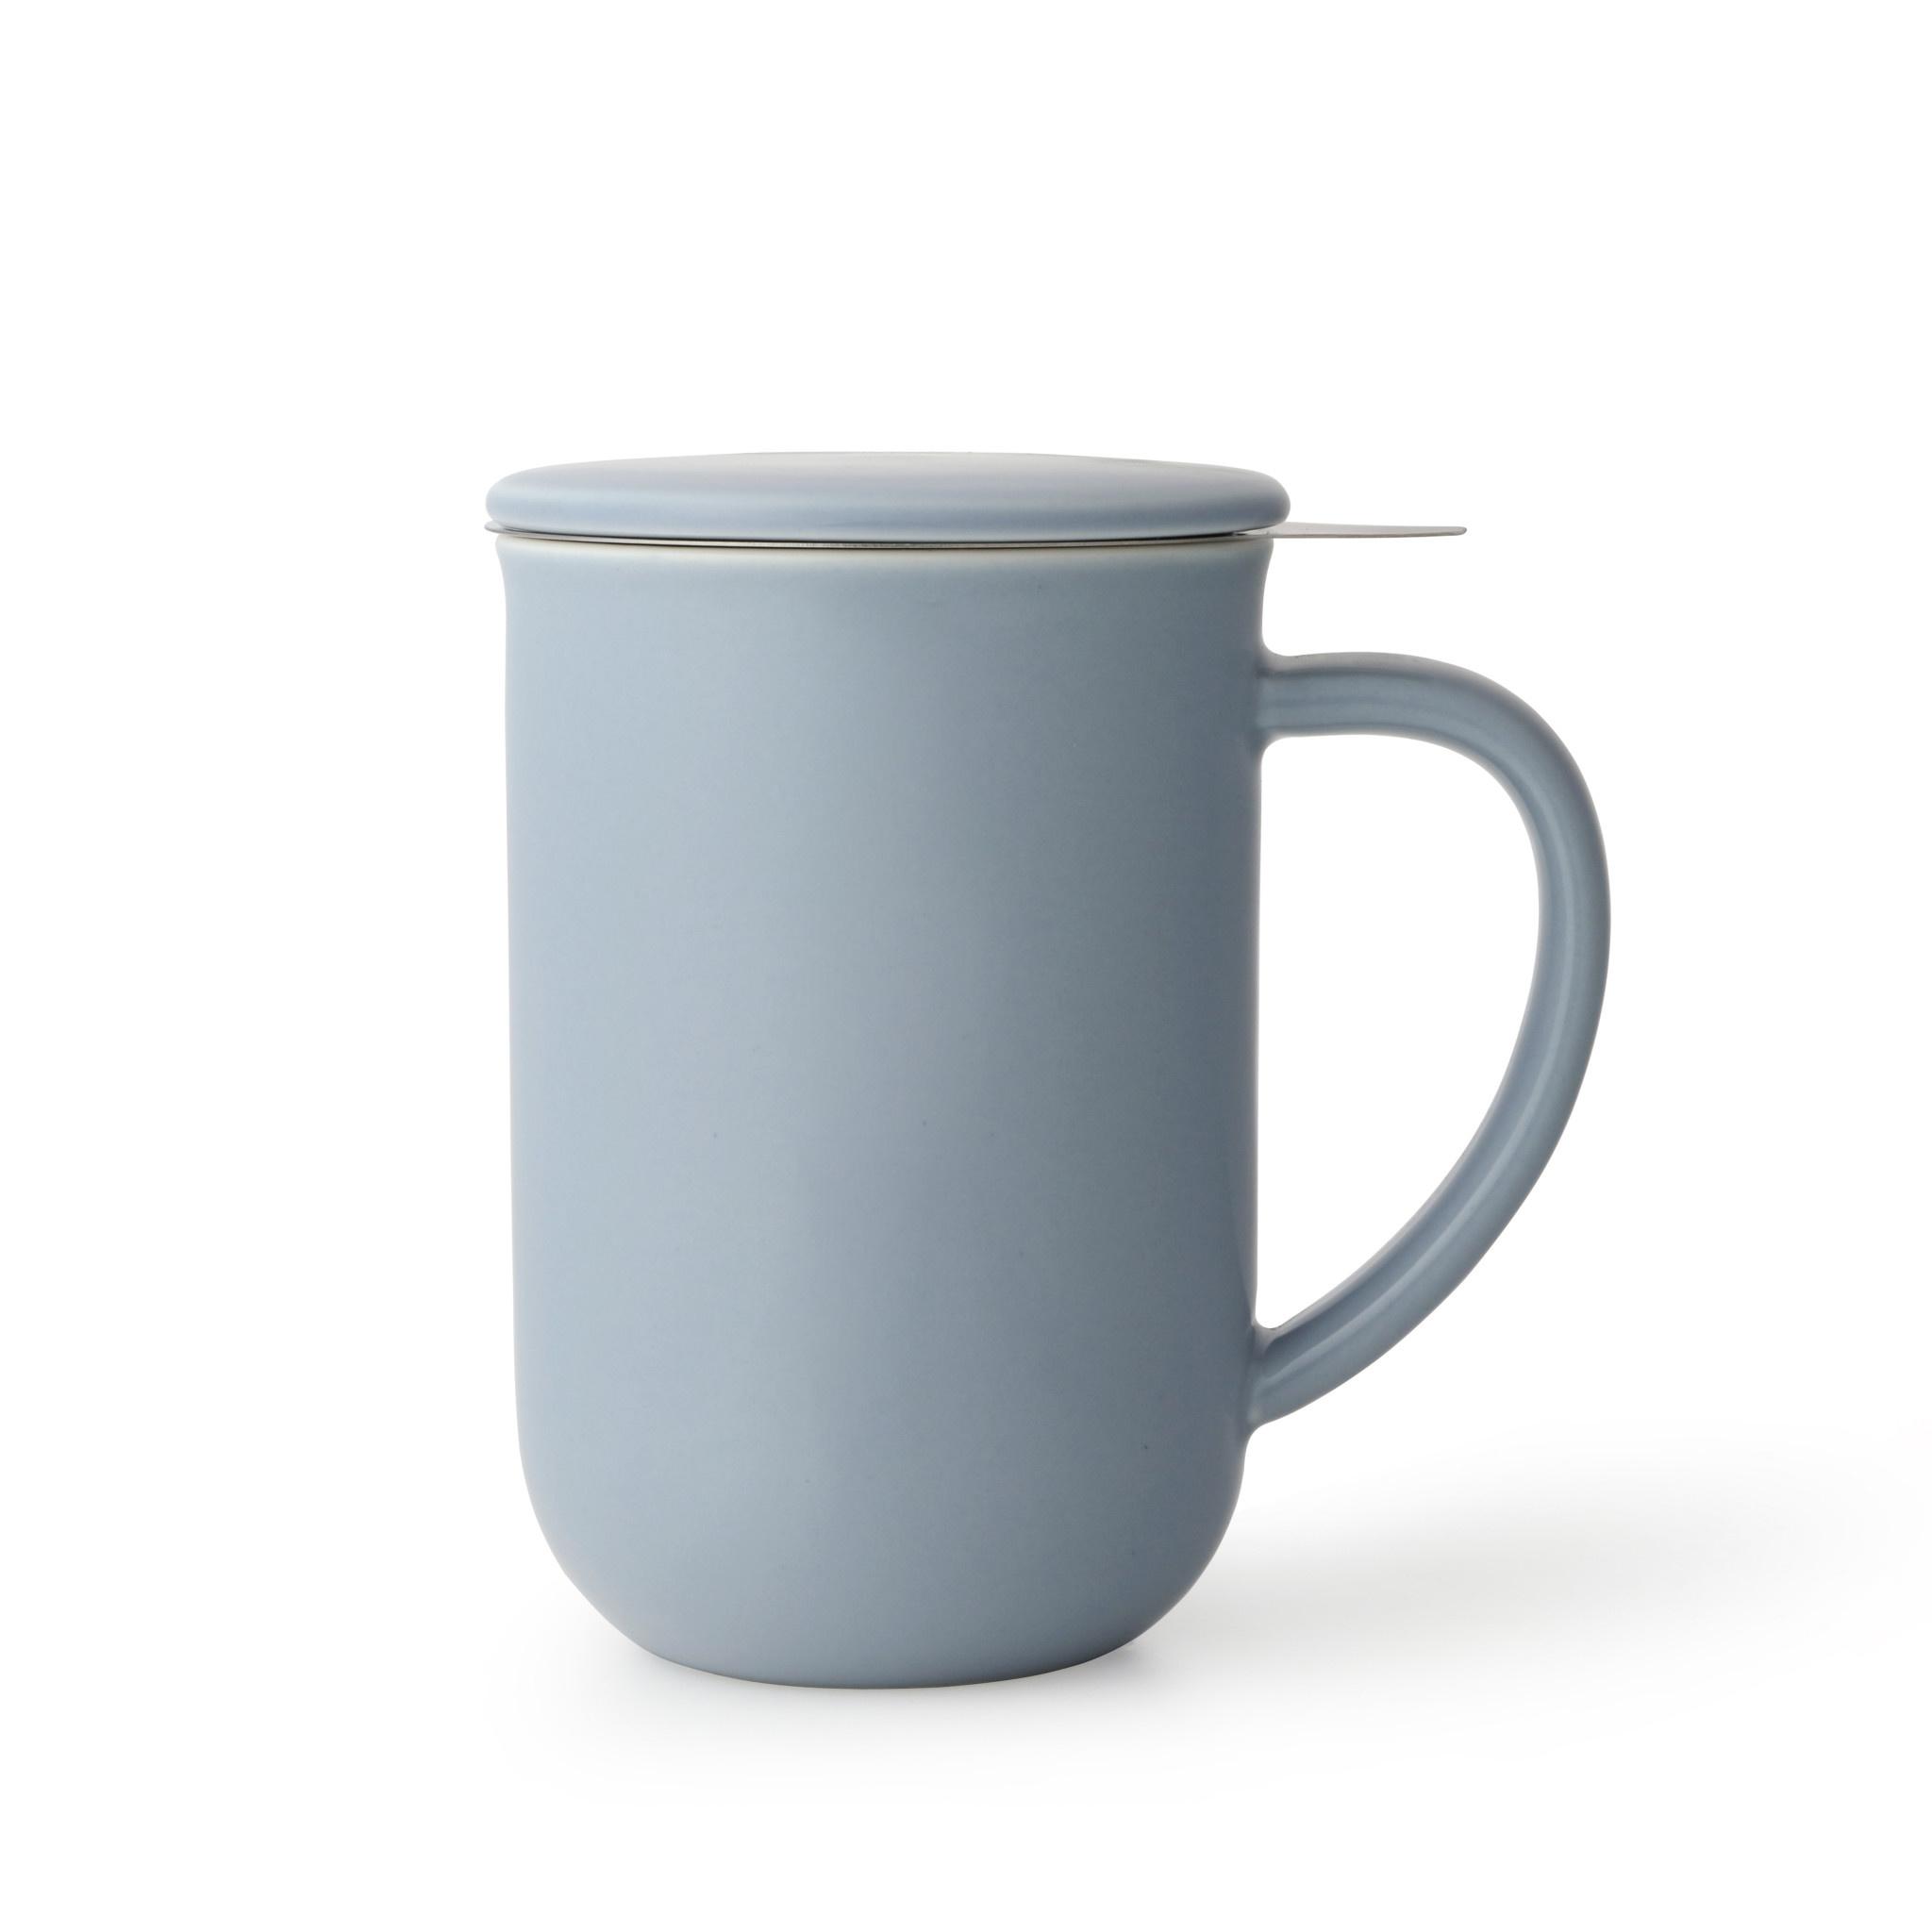 Minima™ Balance tea mug